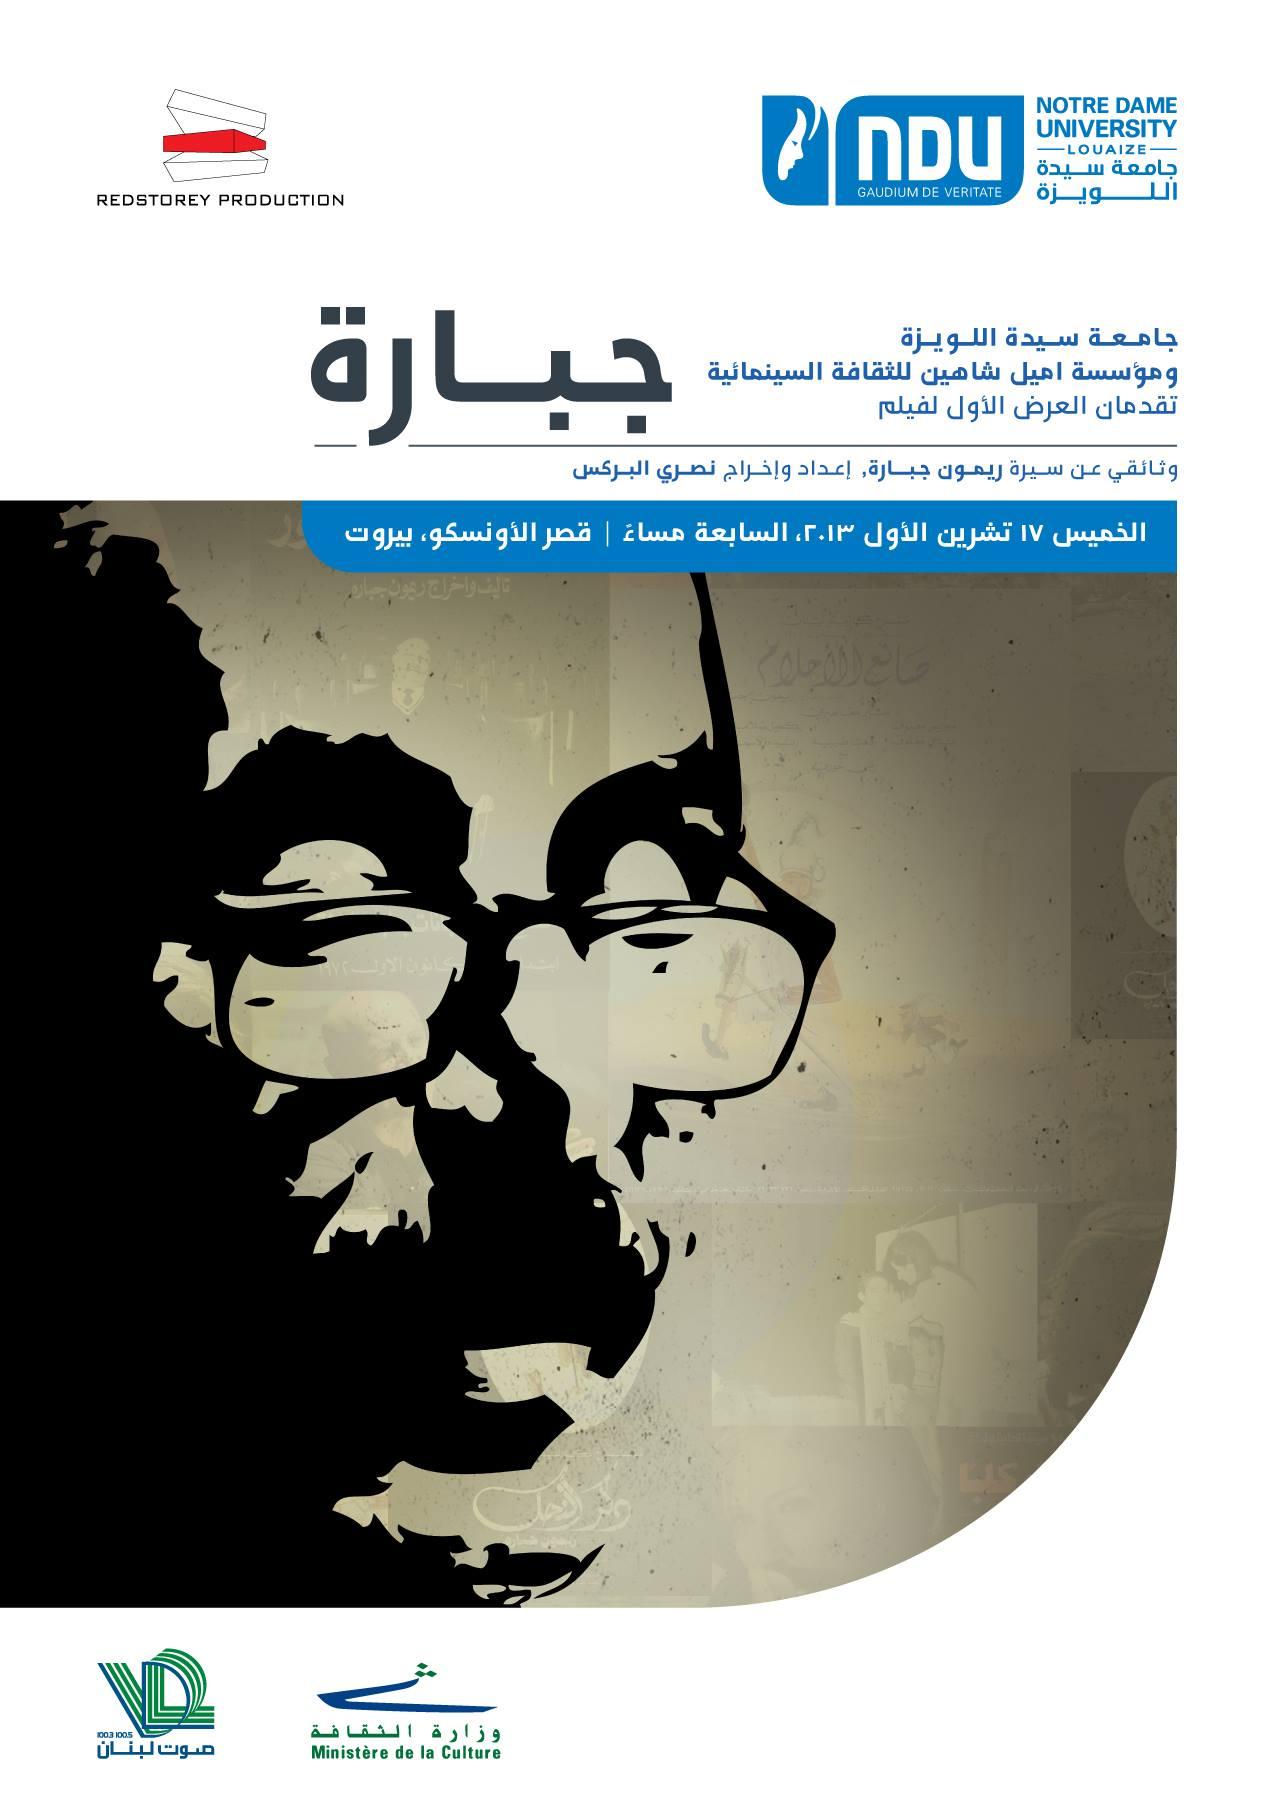 Affiche du film Jbara, (page facebook de Nasri Brax)